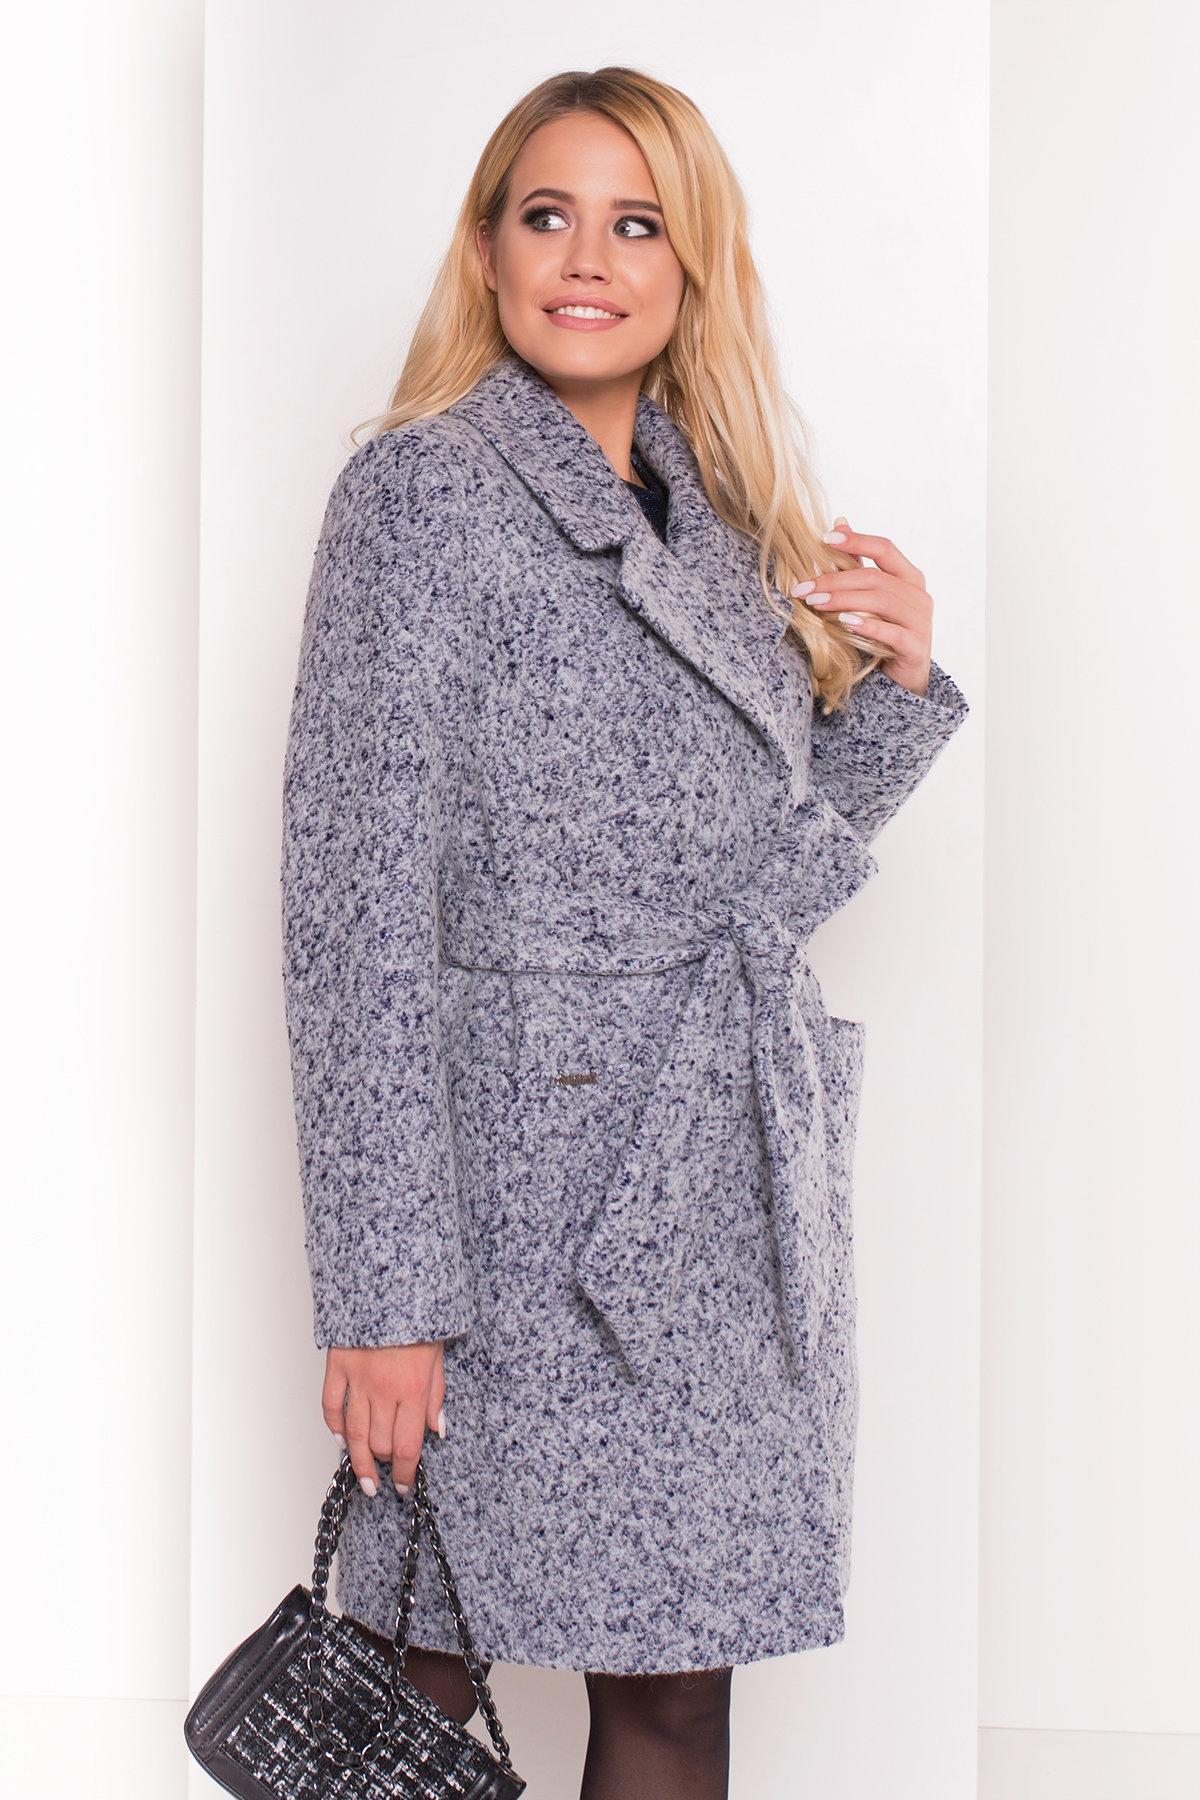 Пальто Мила 5698 Цвет: Серый/голубой